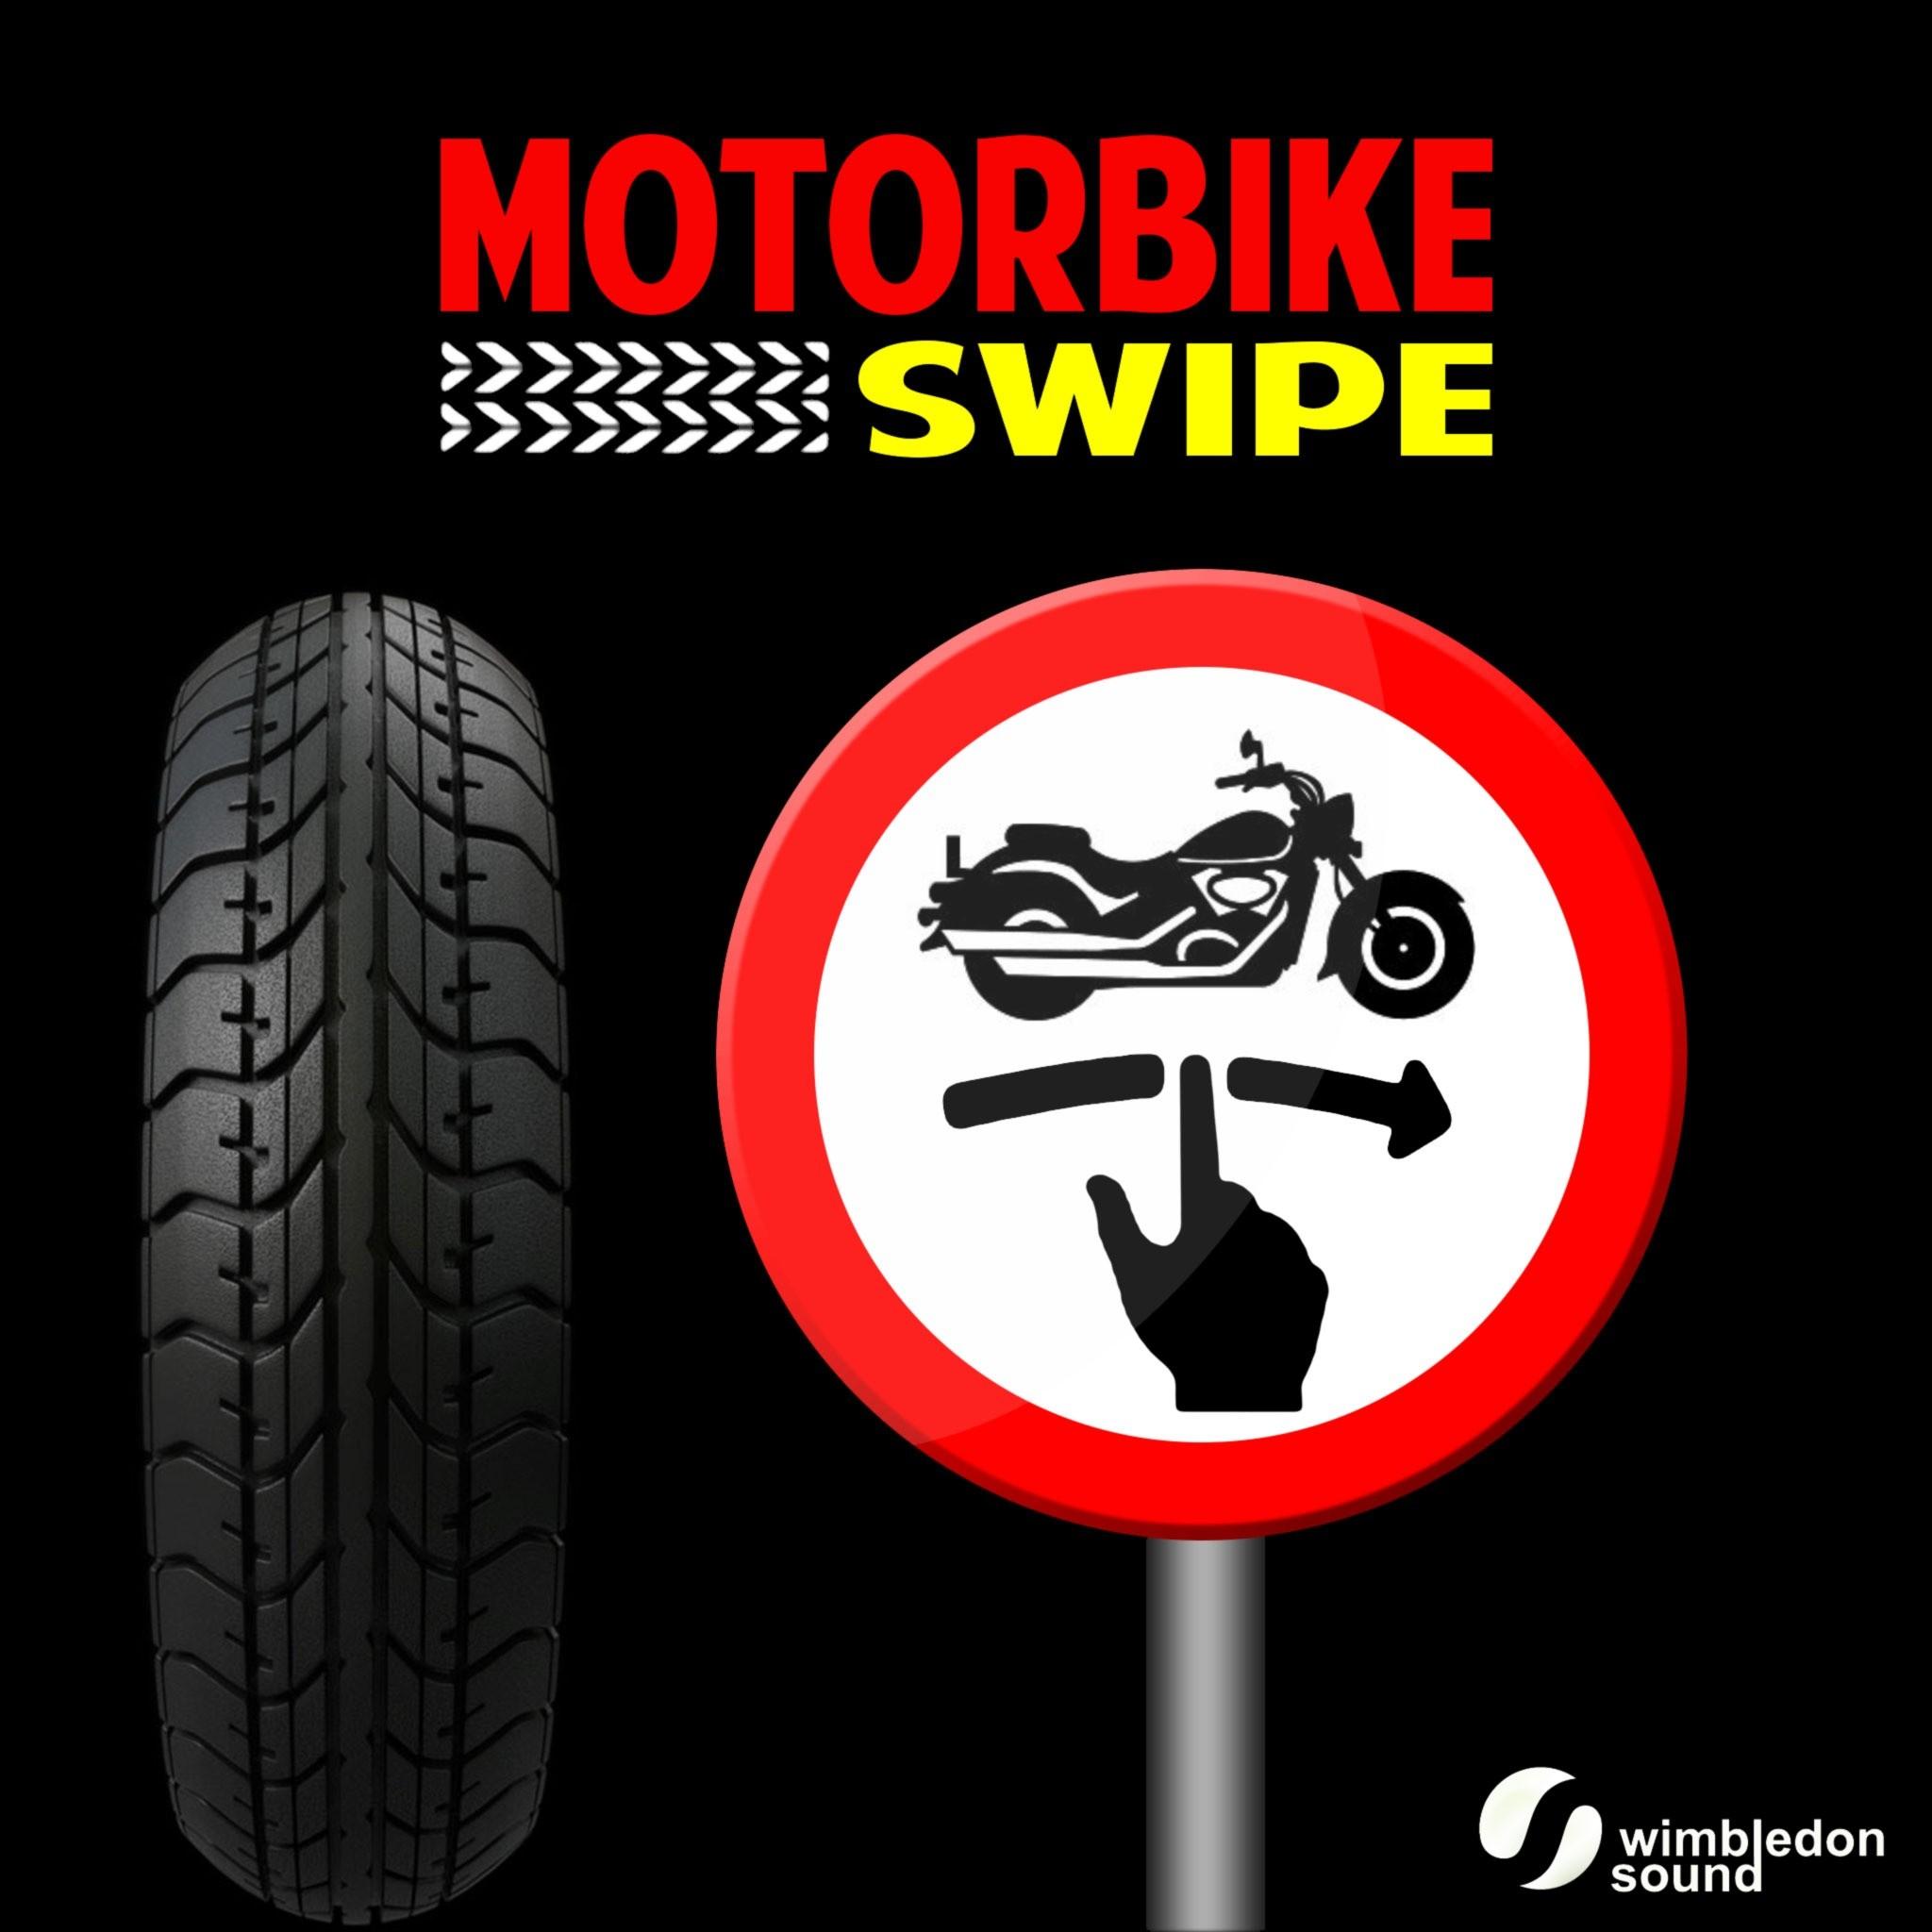 Motorbike Swipe